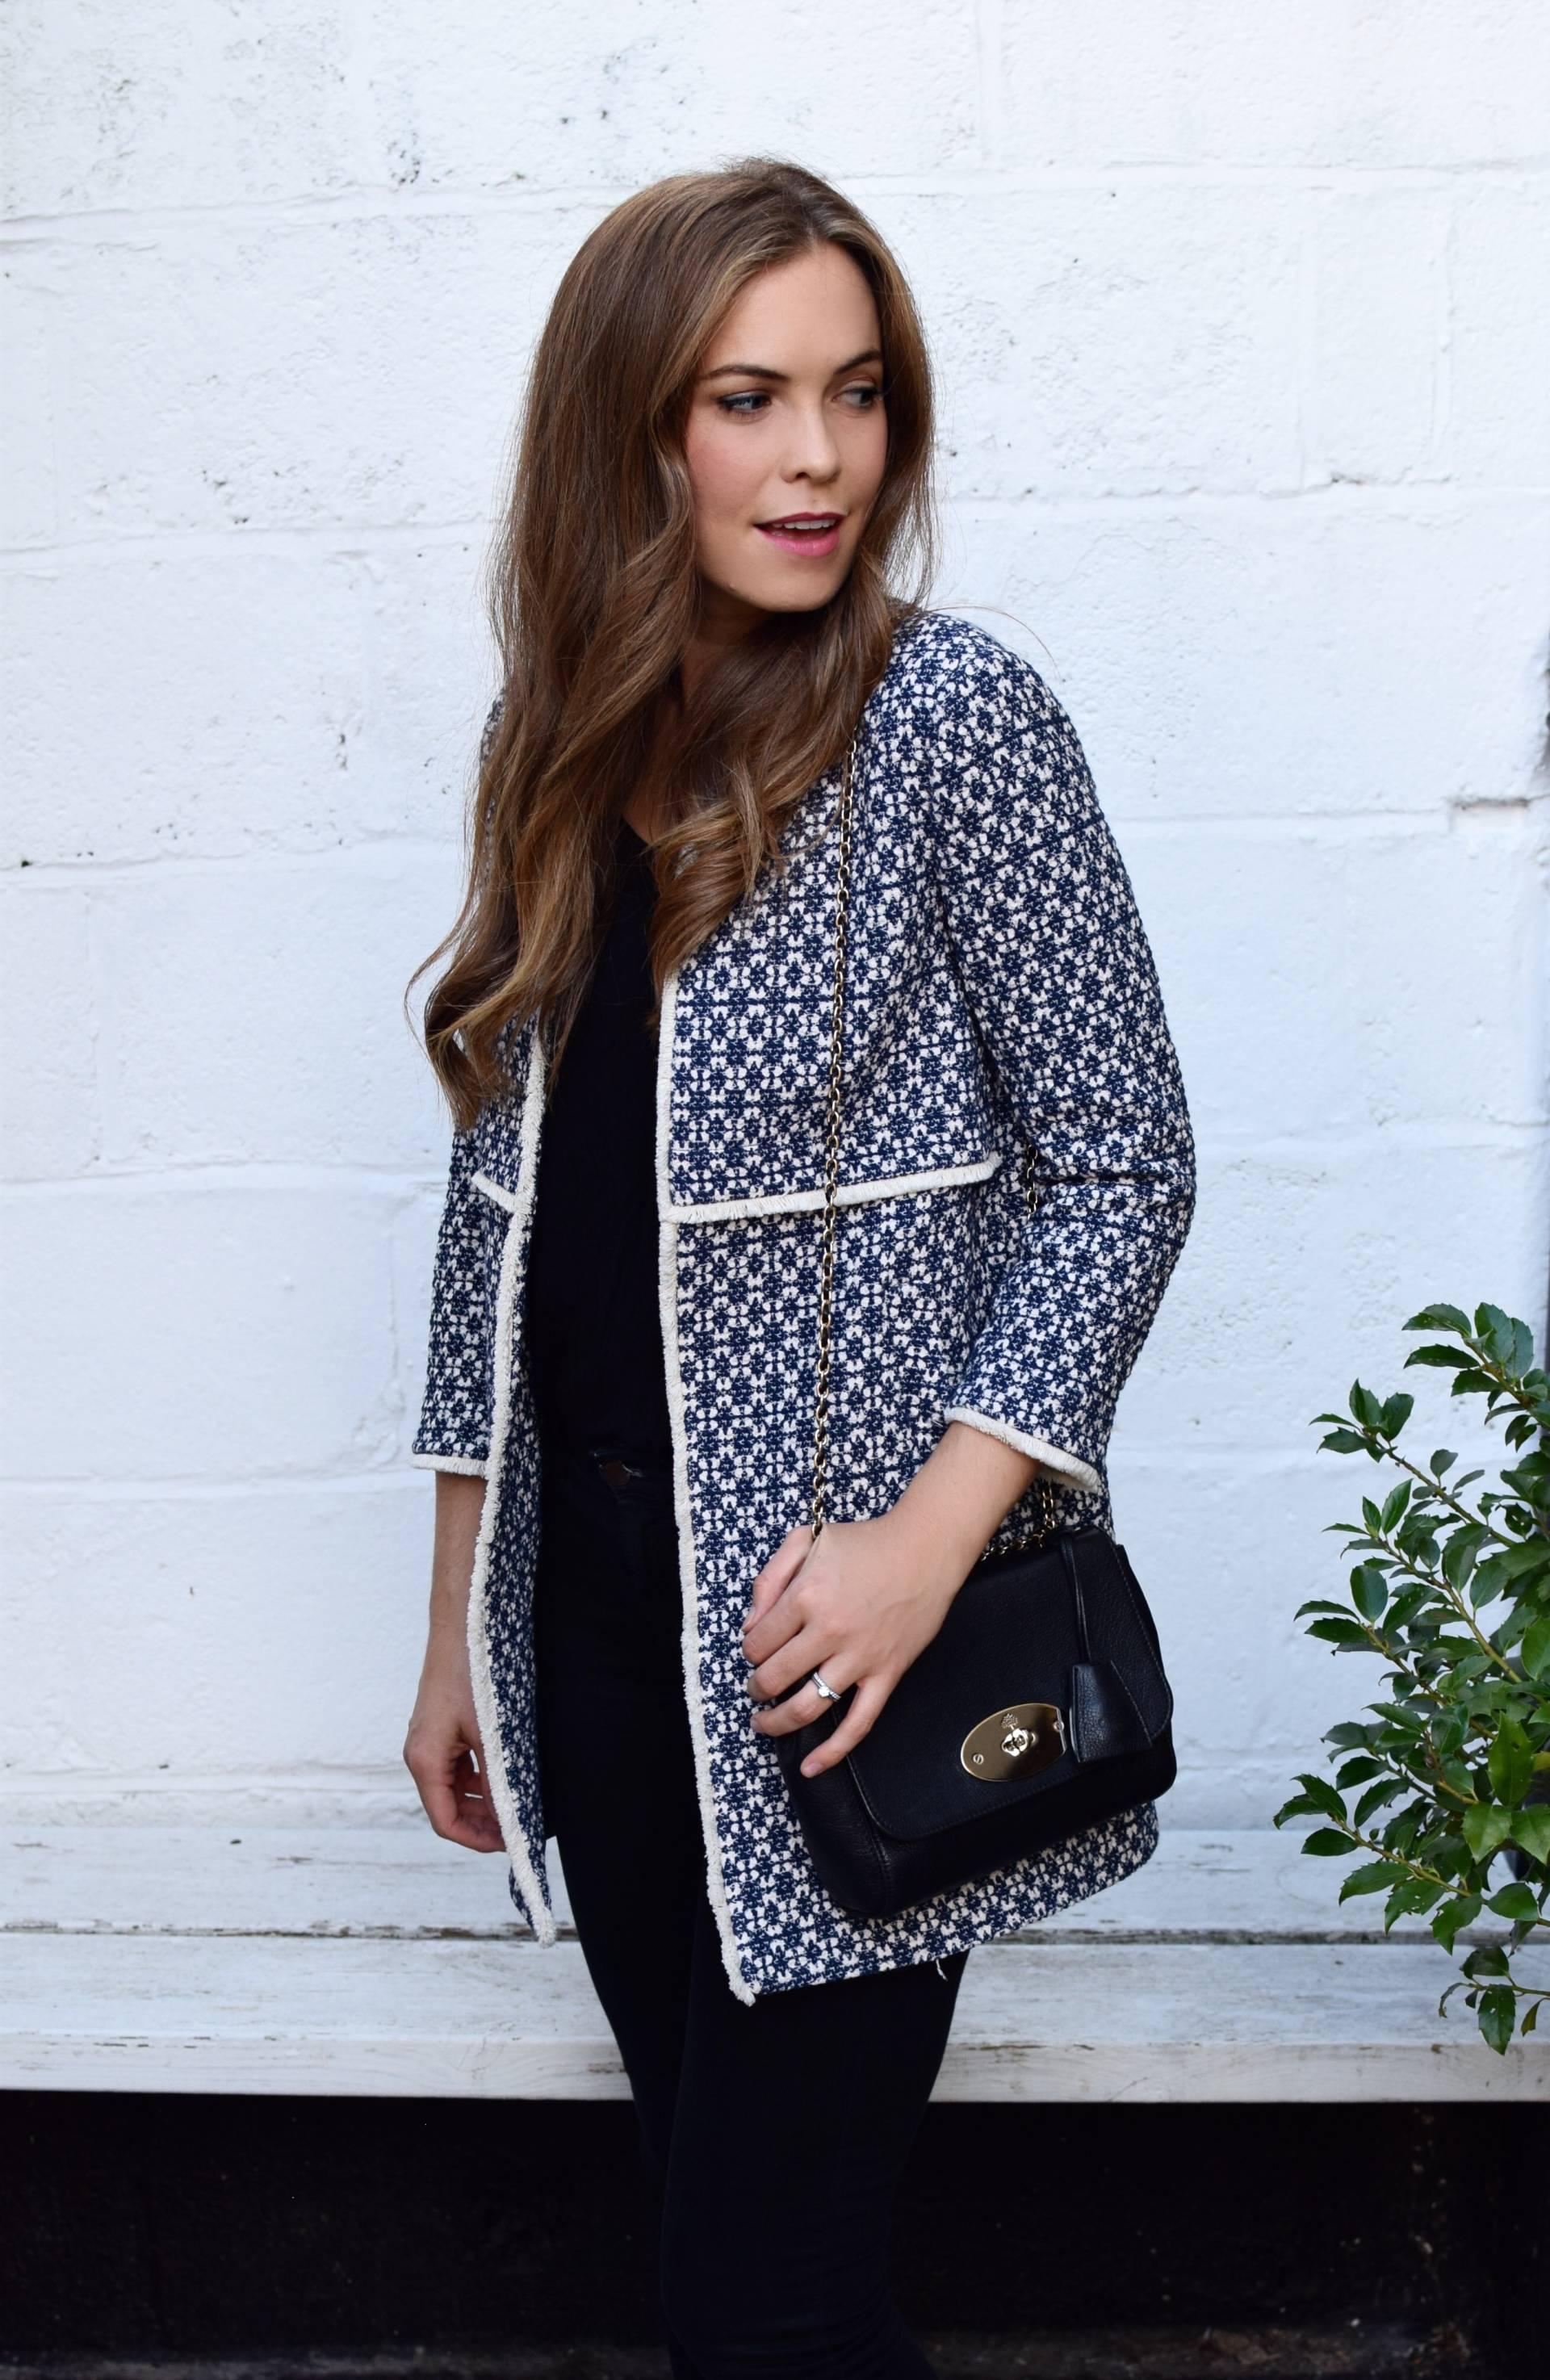 #thatcoat   Megan Taylor